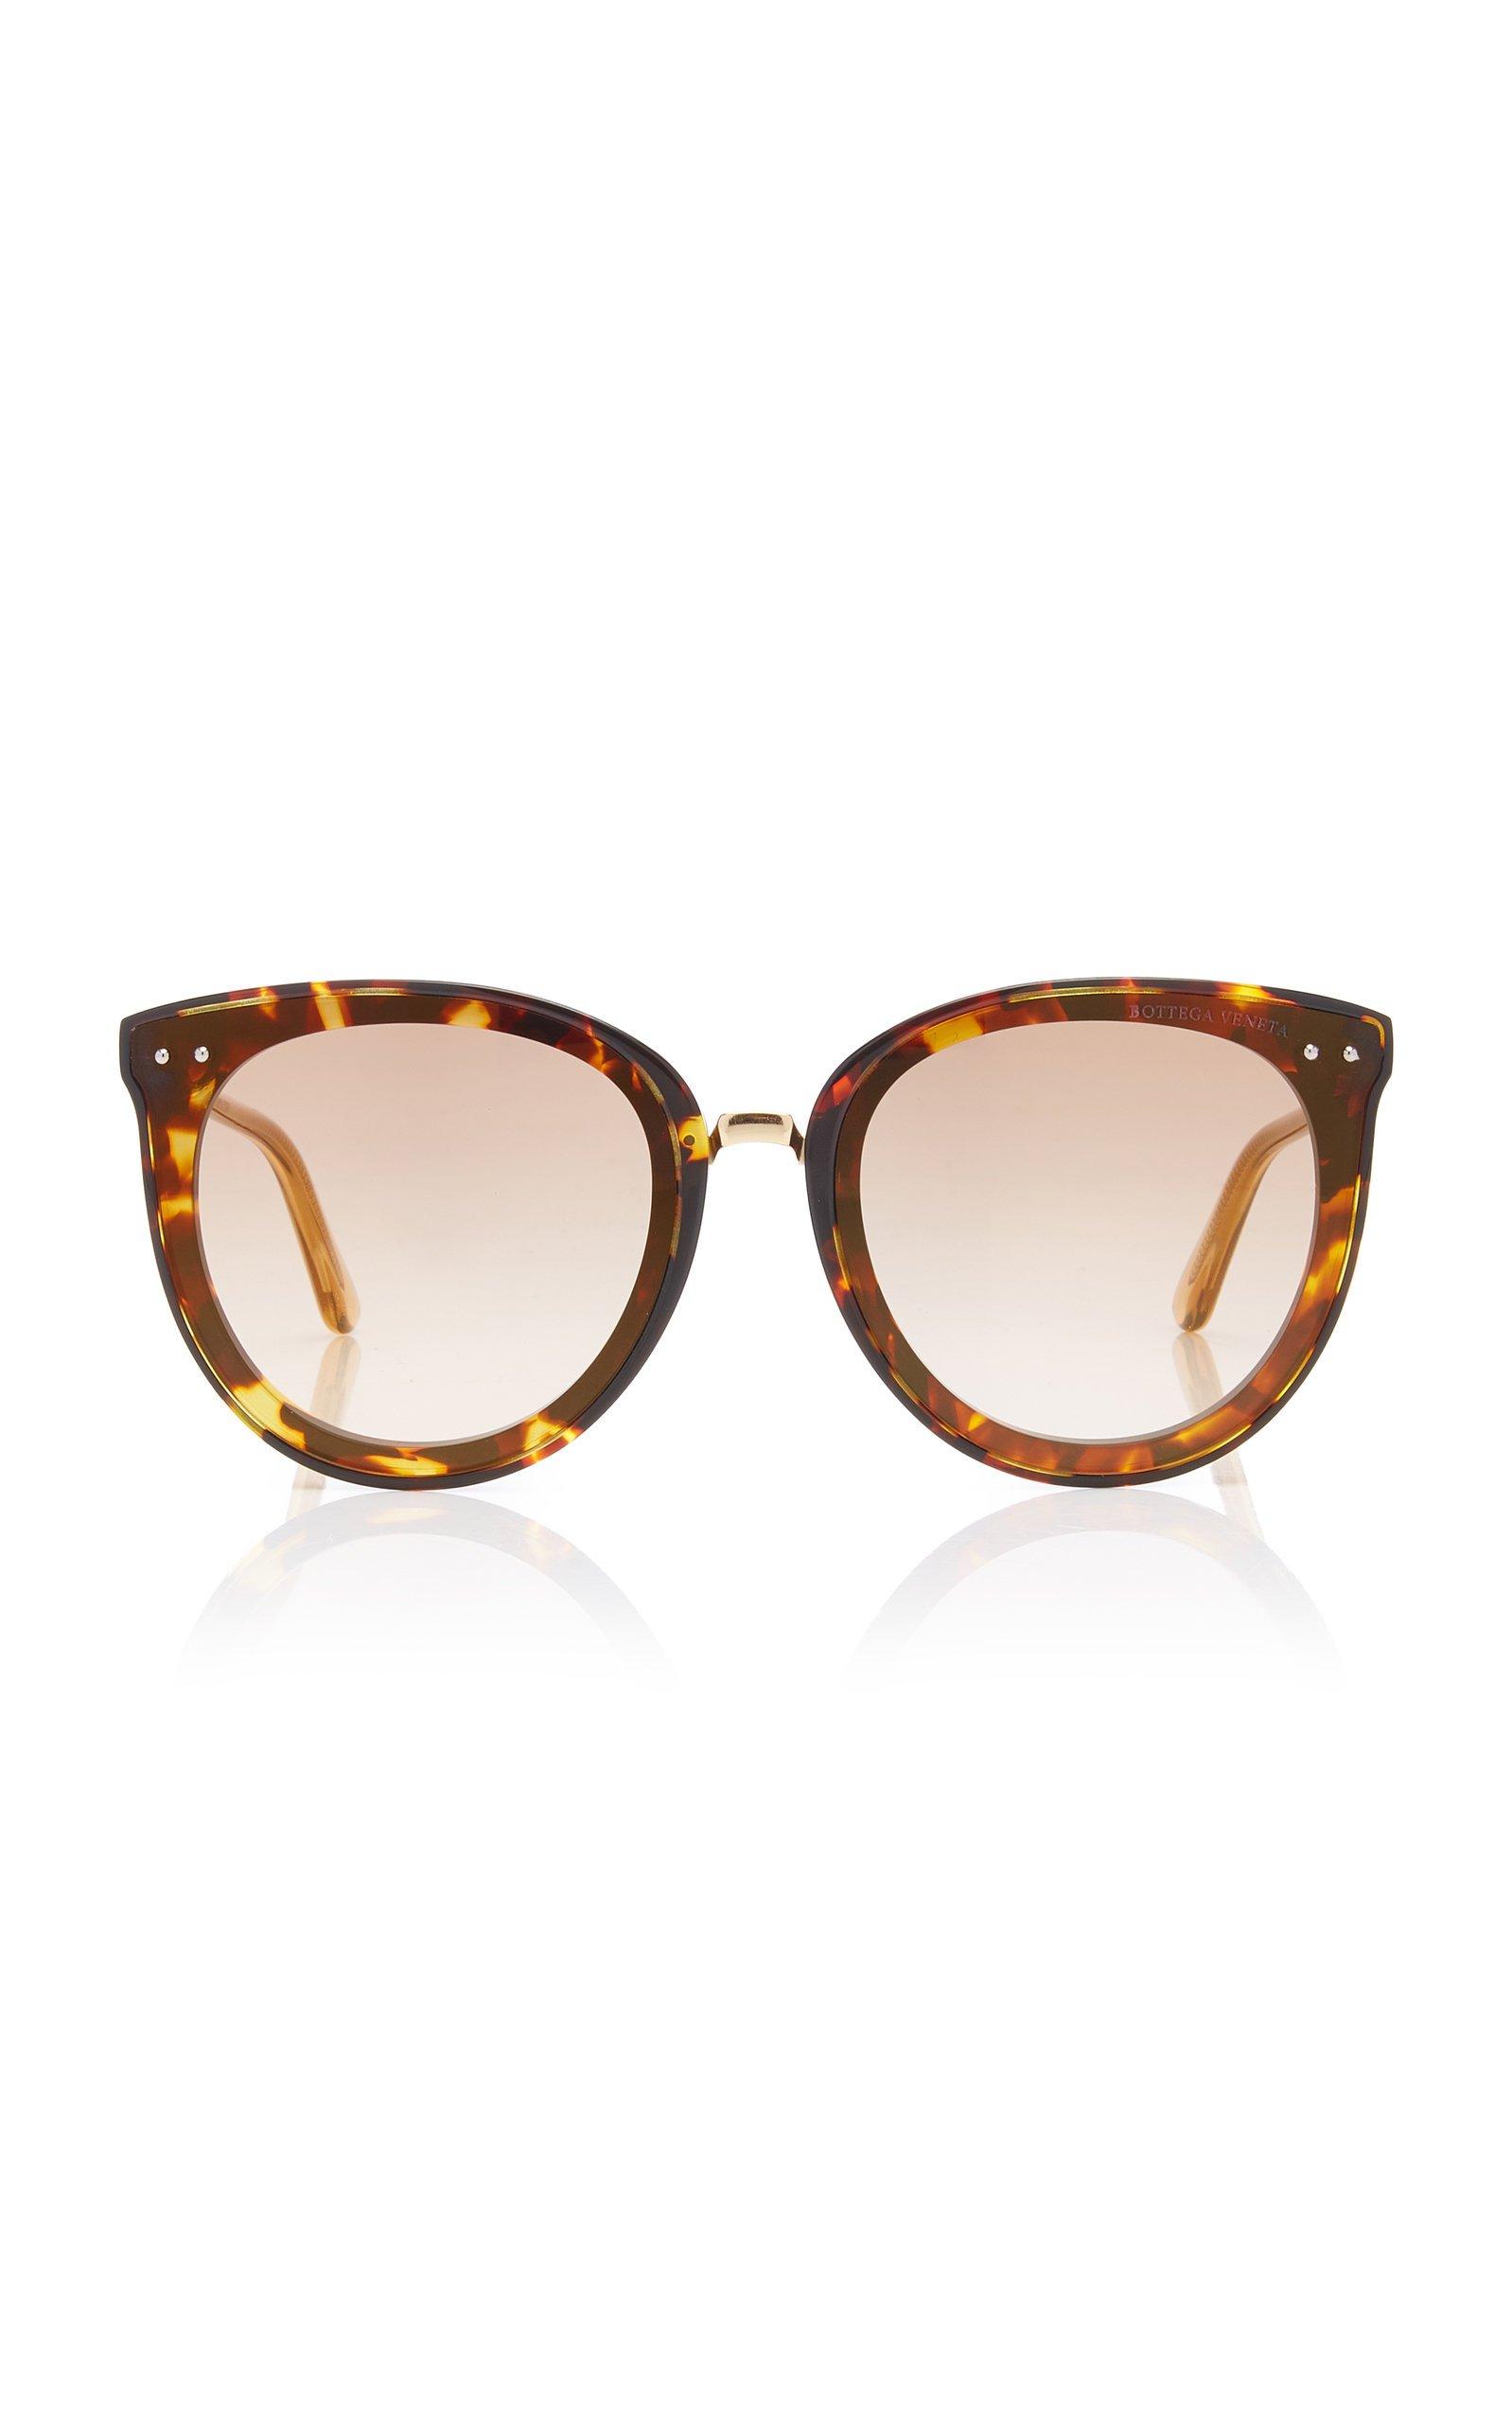 Bottega Veneta Sunglasses Oversized Tortoiseshell Acetate Cat-Eye Sunglasses